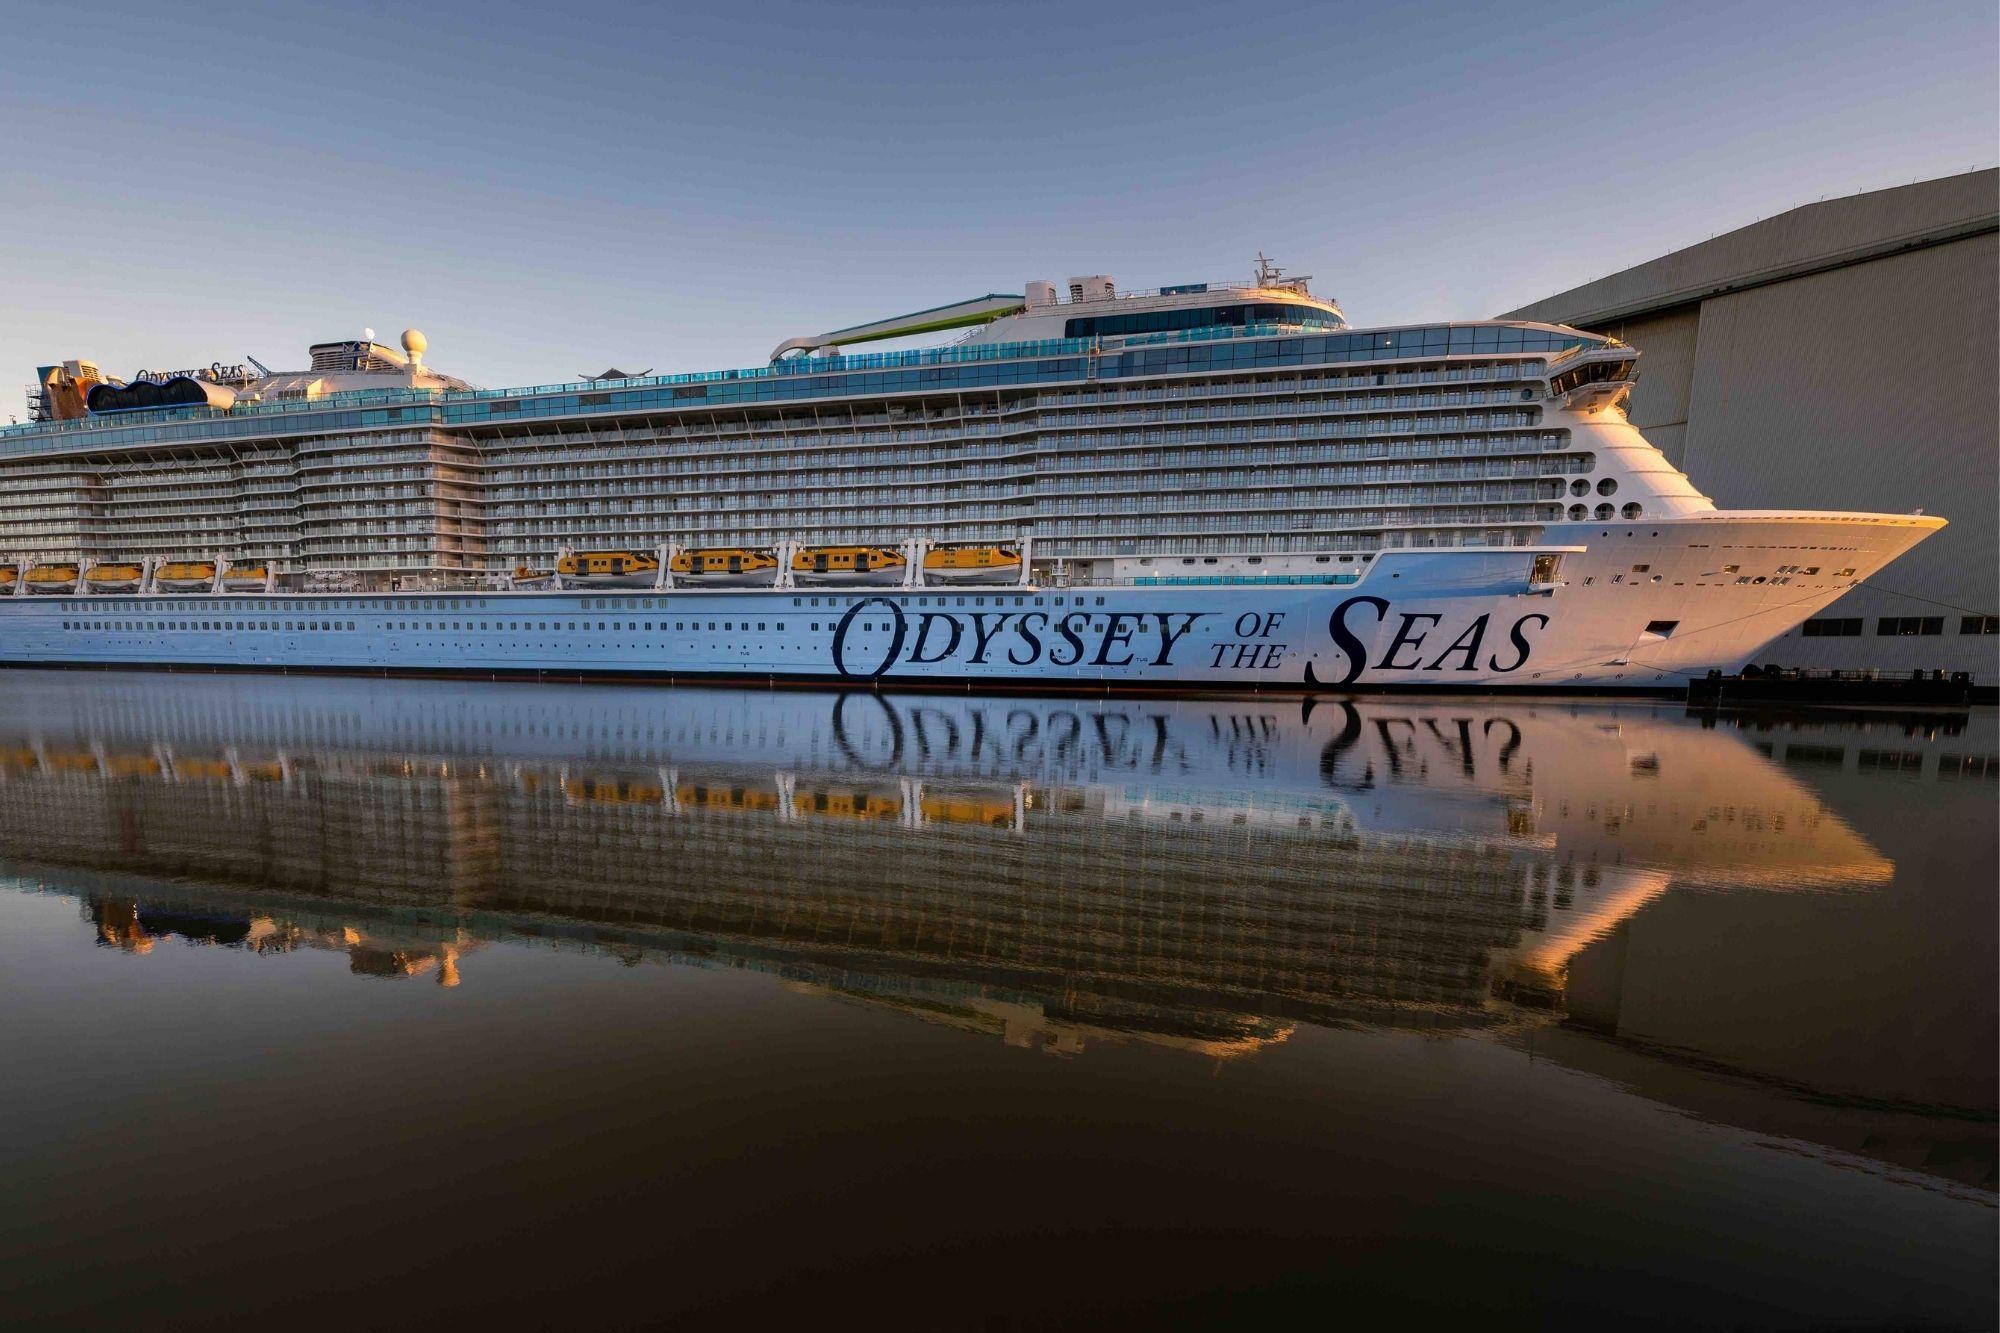 Royal Caribbean: Odyssey of the Seas ab Mai für Israelis mit Impfung